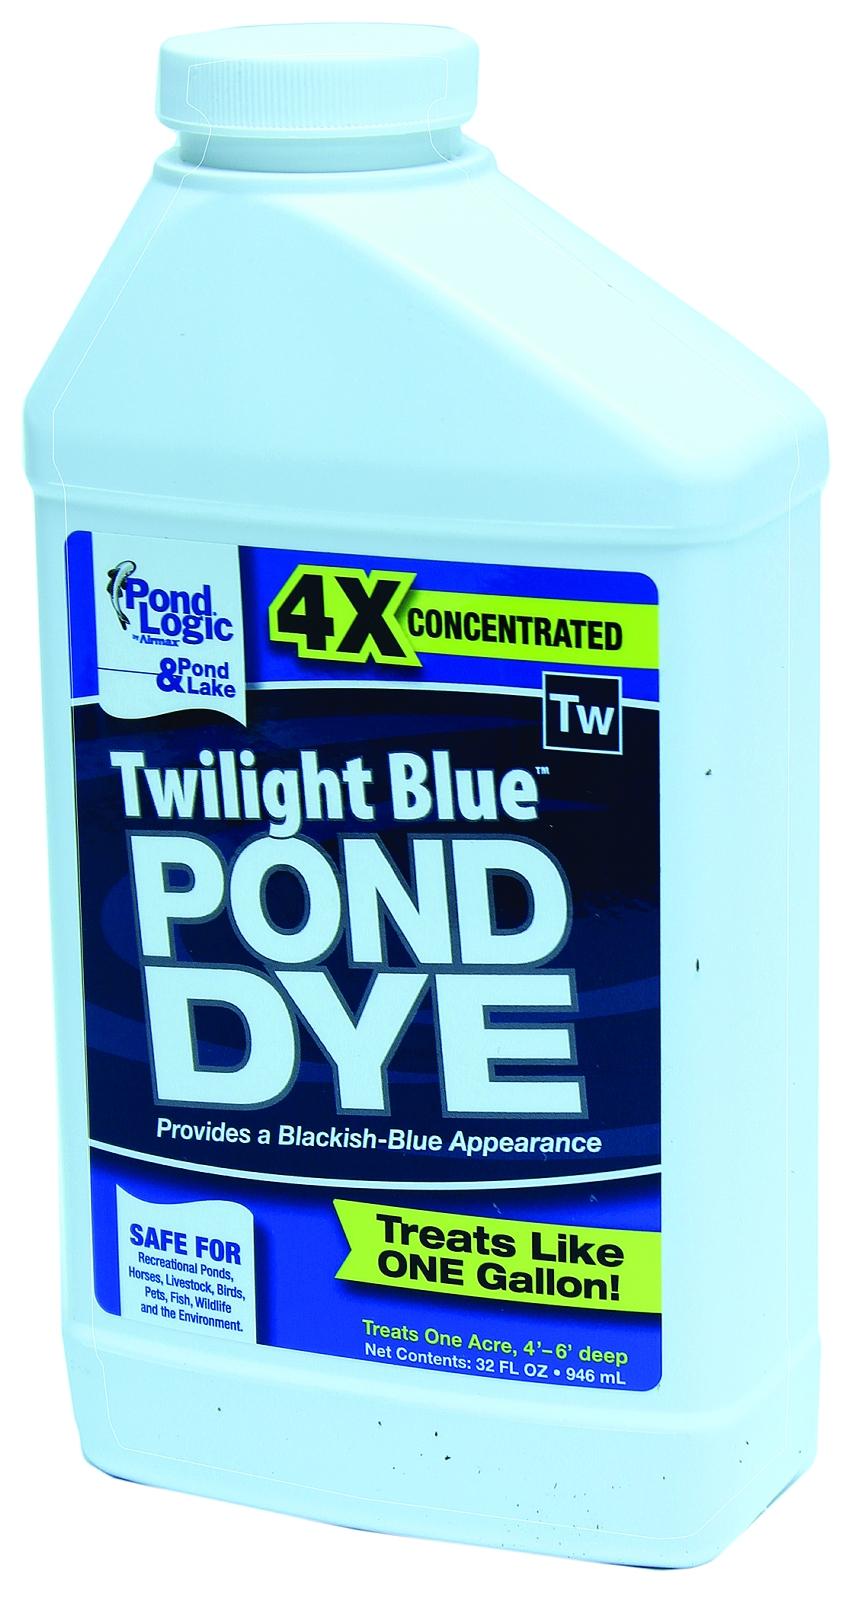 Twilight Blue Pond Dye